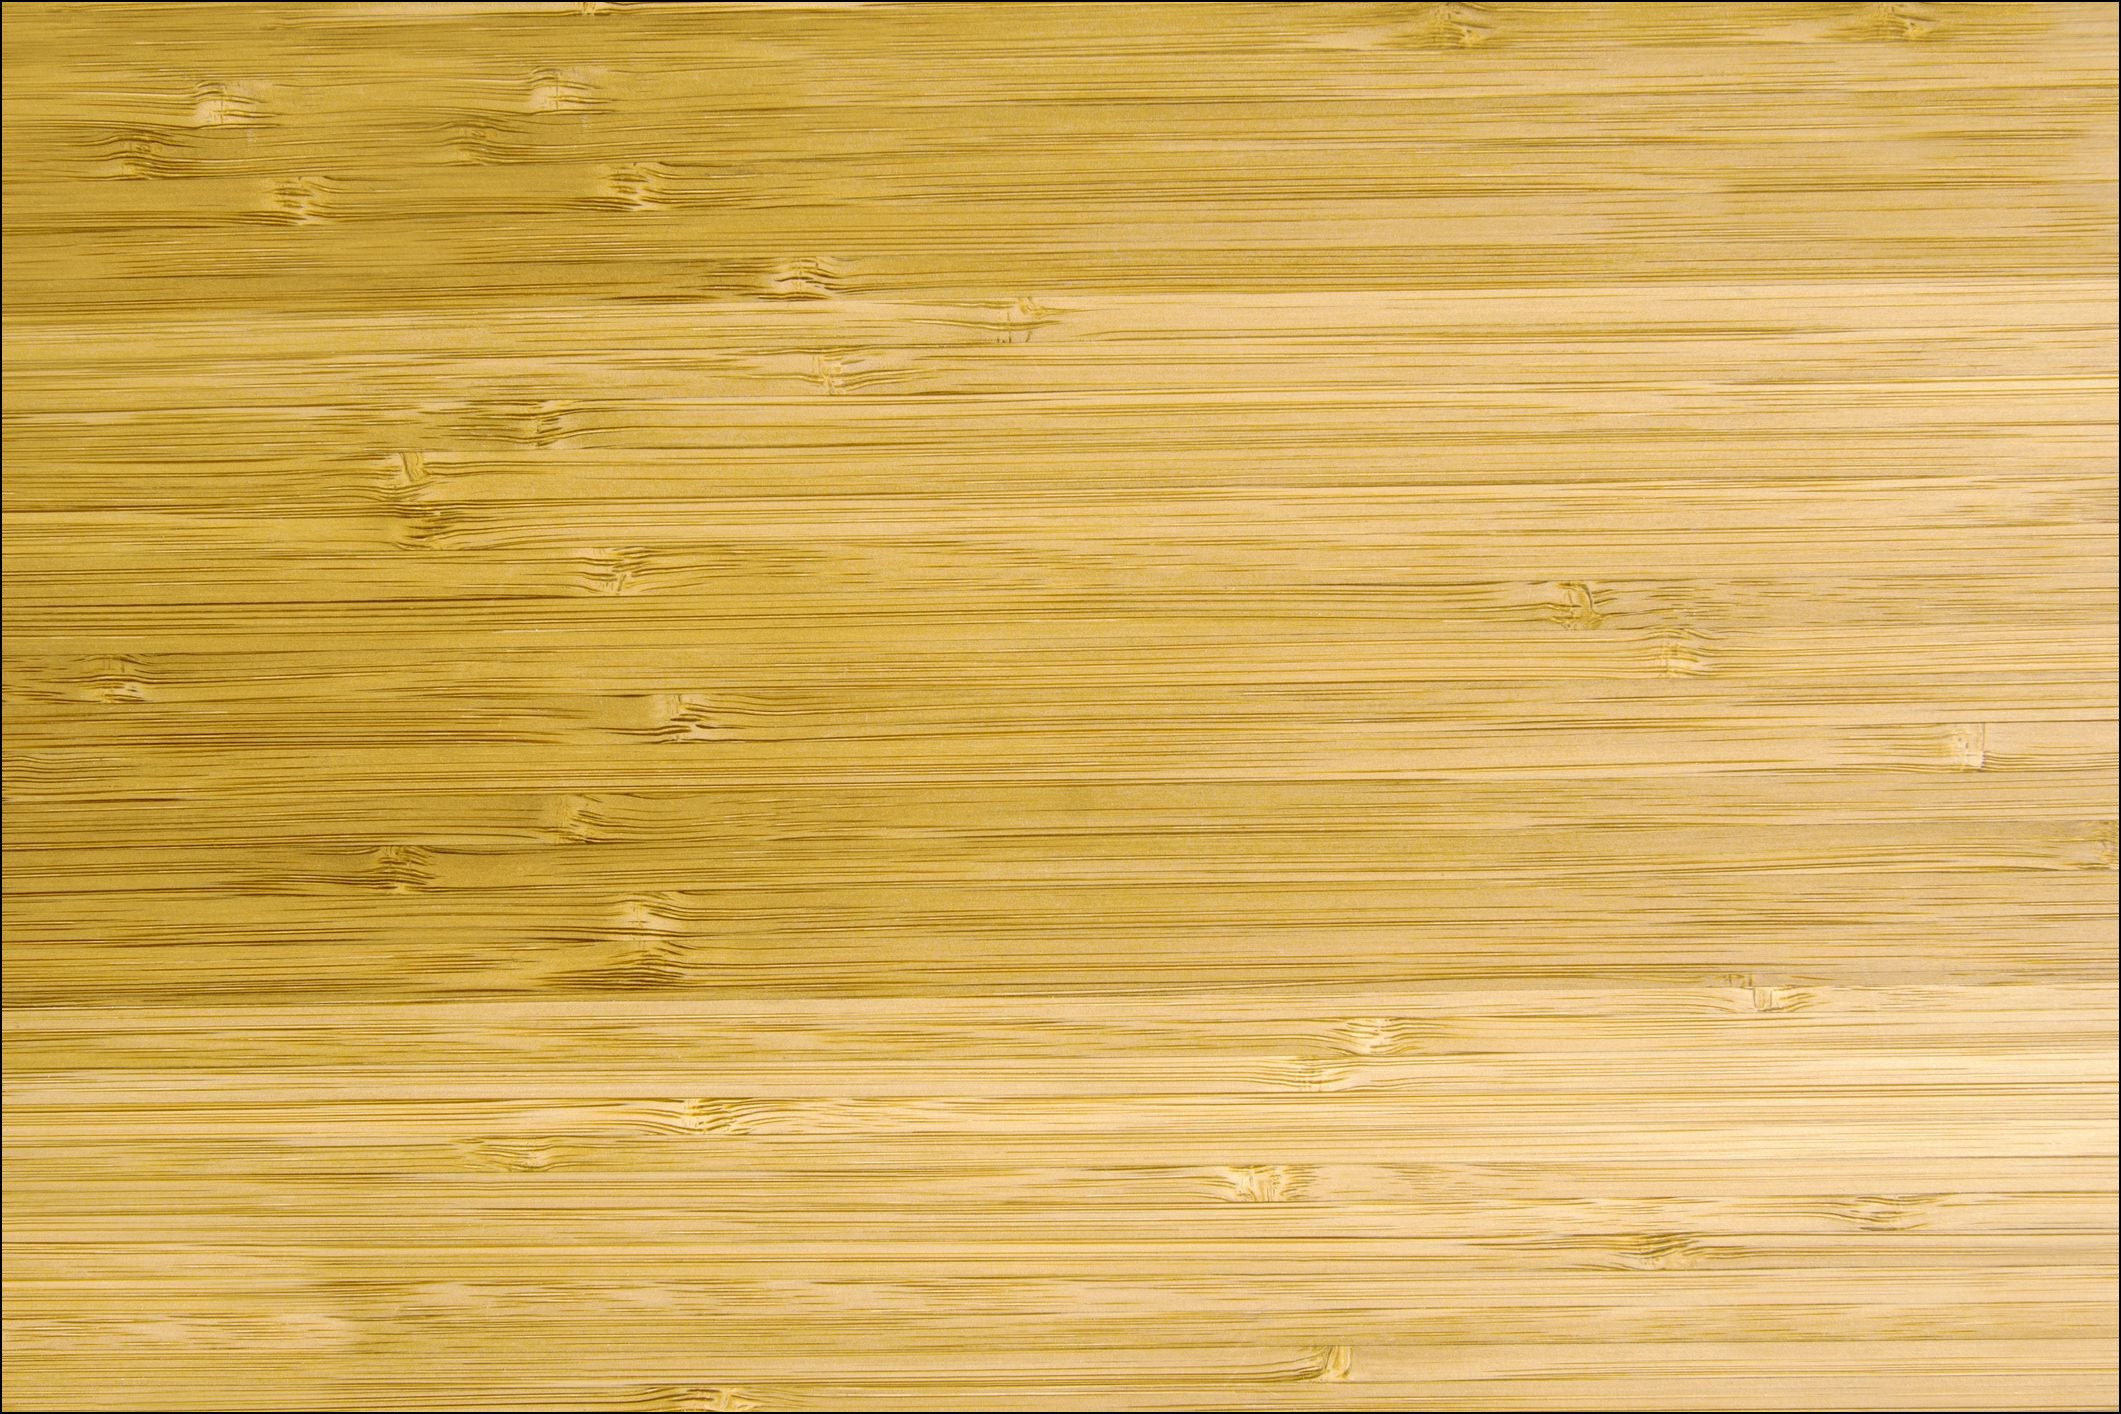 best hardwood flooring toronto of hardwood flooring suppliers france flooring ideas regarding hardwood flooring installation san diego images 5 best bamboo floors of hardwood flooring installation san diego